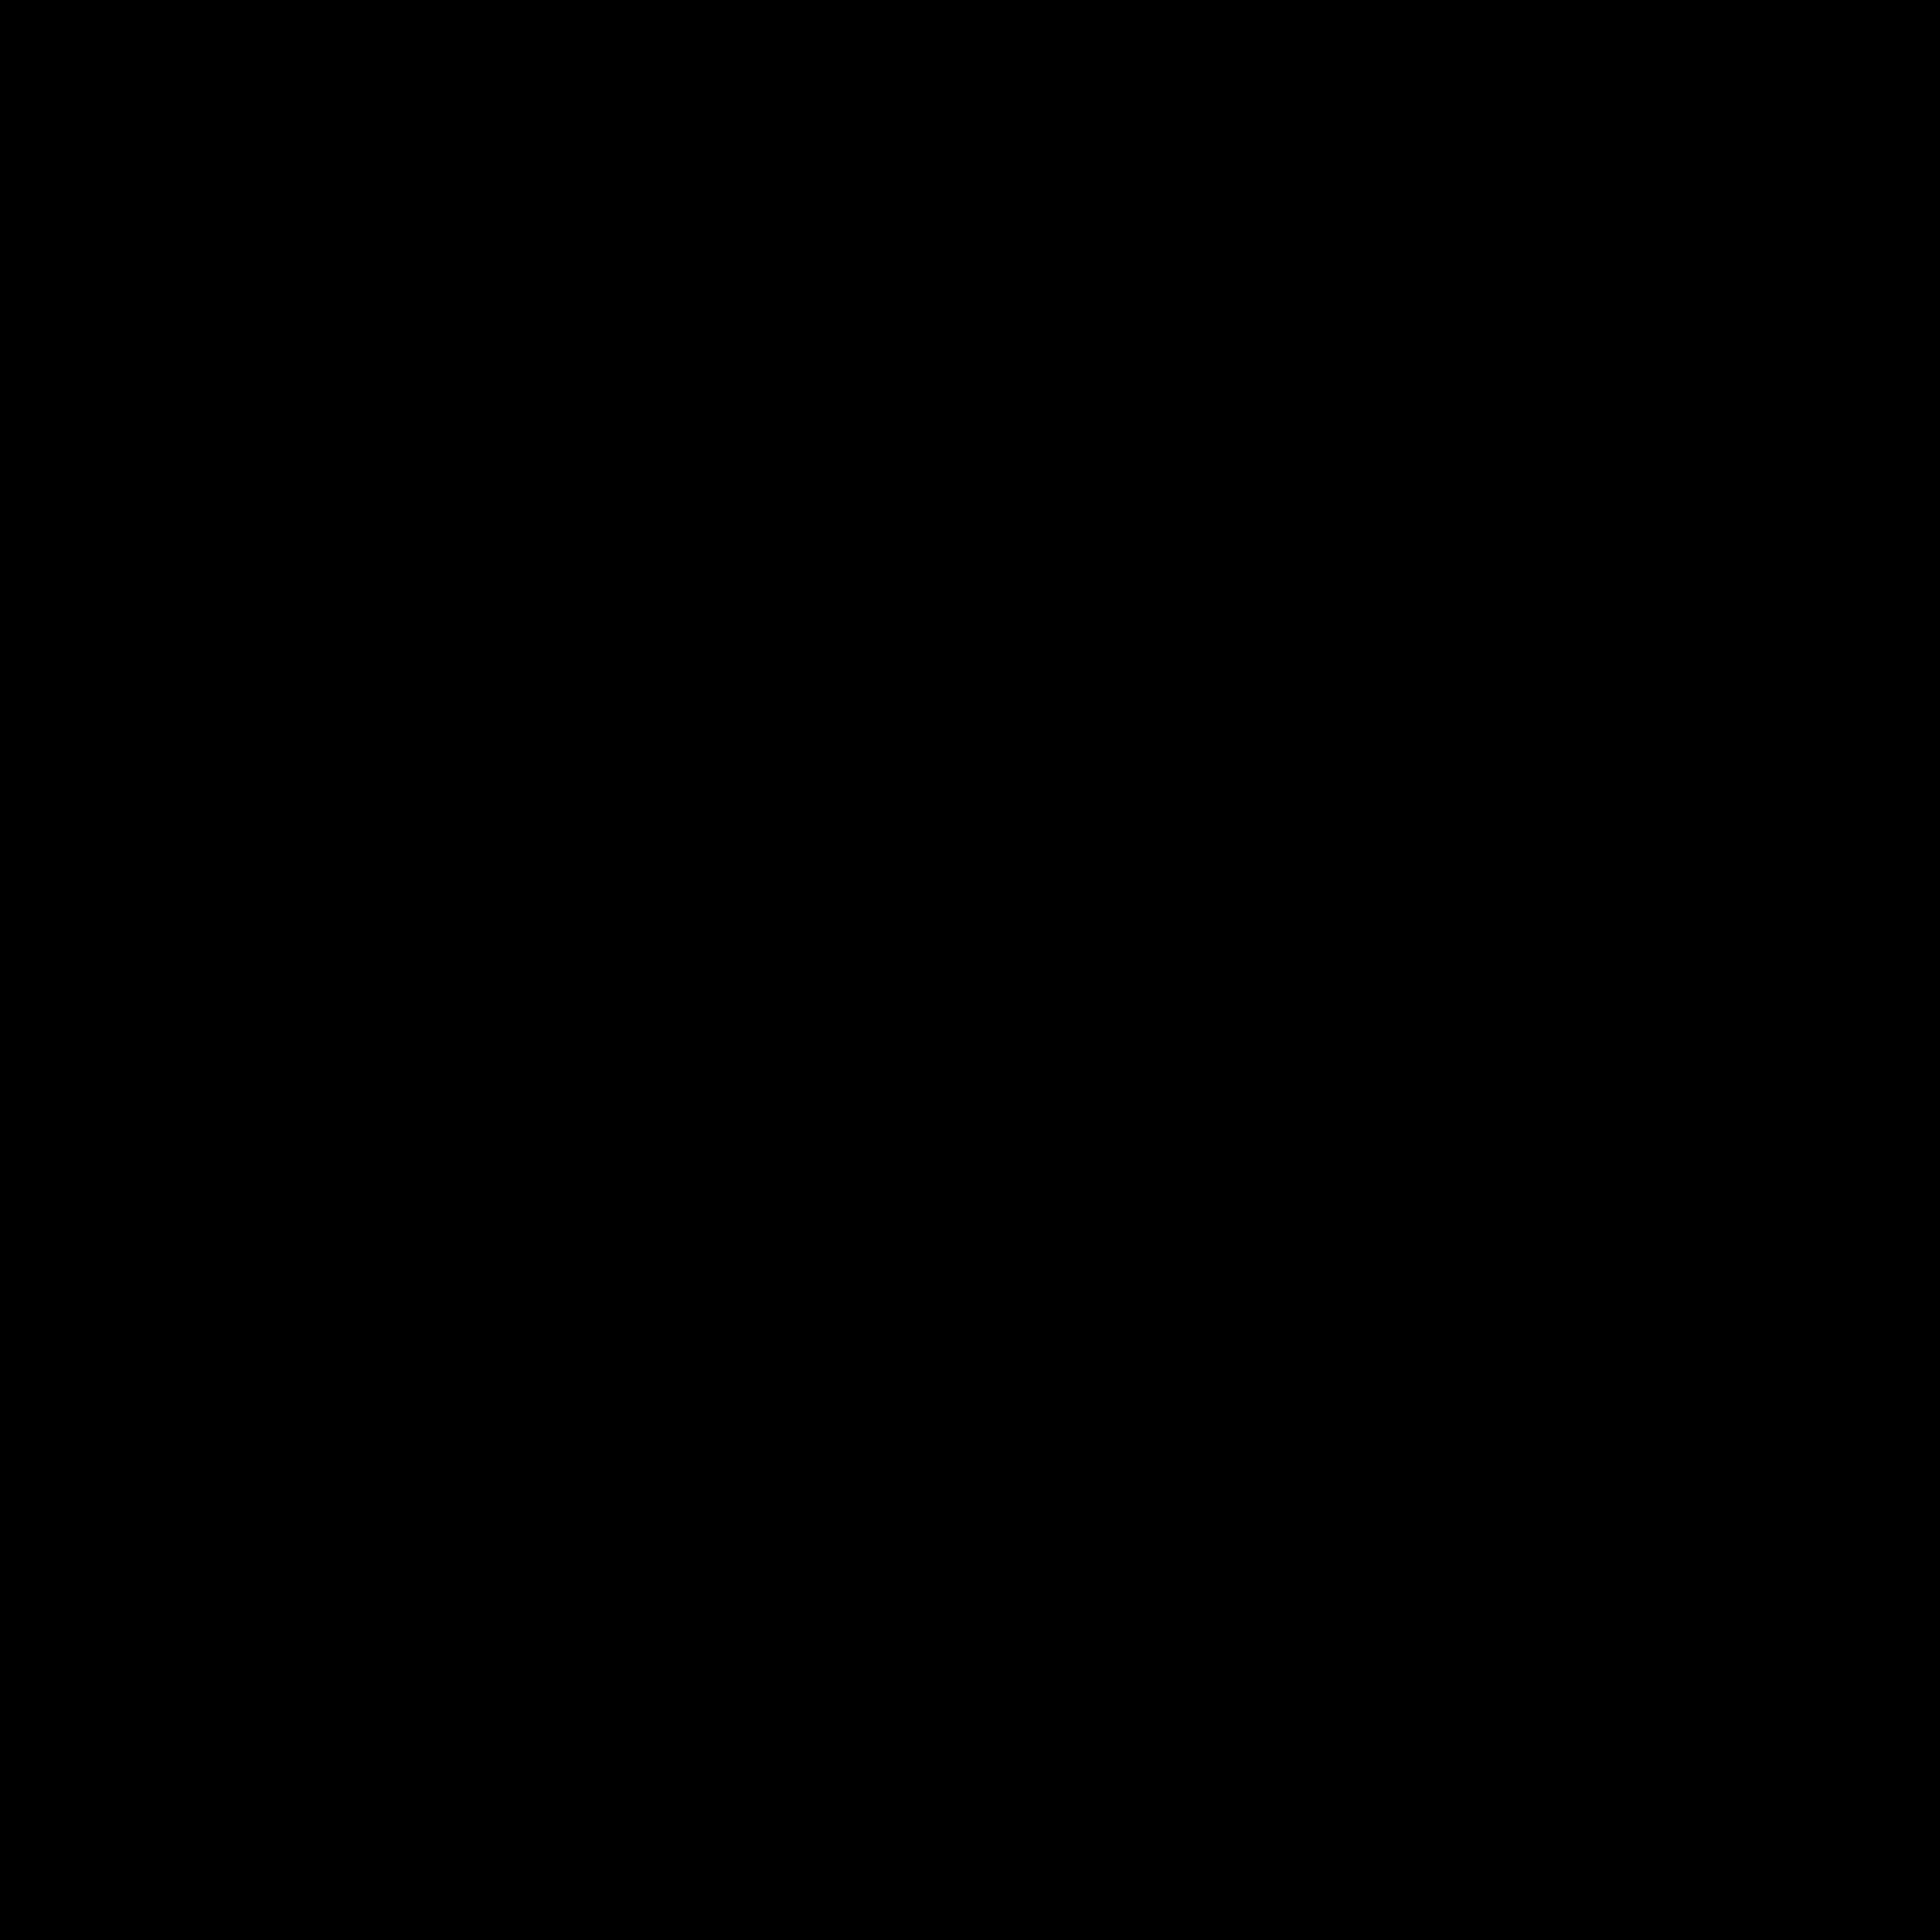 Logo Ljungskogen @ljungskogen #ljungskogen